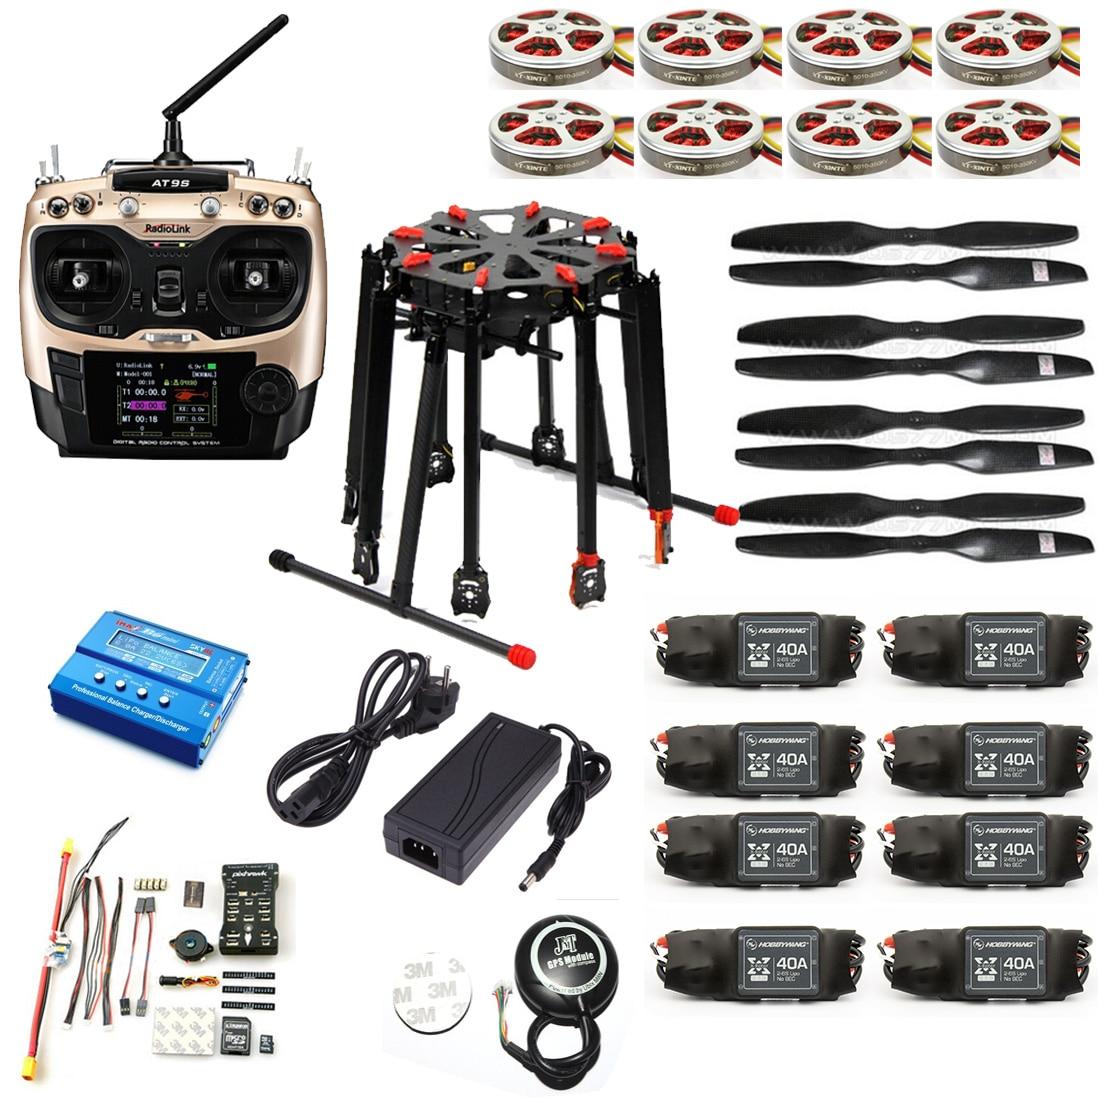 DIY GPS Drone Tarot X8 TL8X000 8-Axis Folding Frame 350KV 40A PX4 32 Bits Flight Controller Radiolink AT9S Transmitter f11270 tarot x8 8 aixs umbrella type folding multicopter uav octocopter drone tl8x000 with retractable landing gear